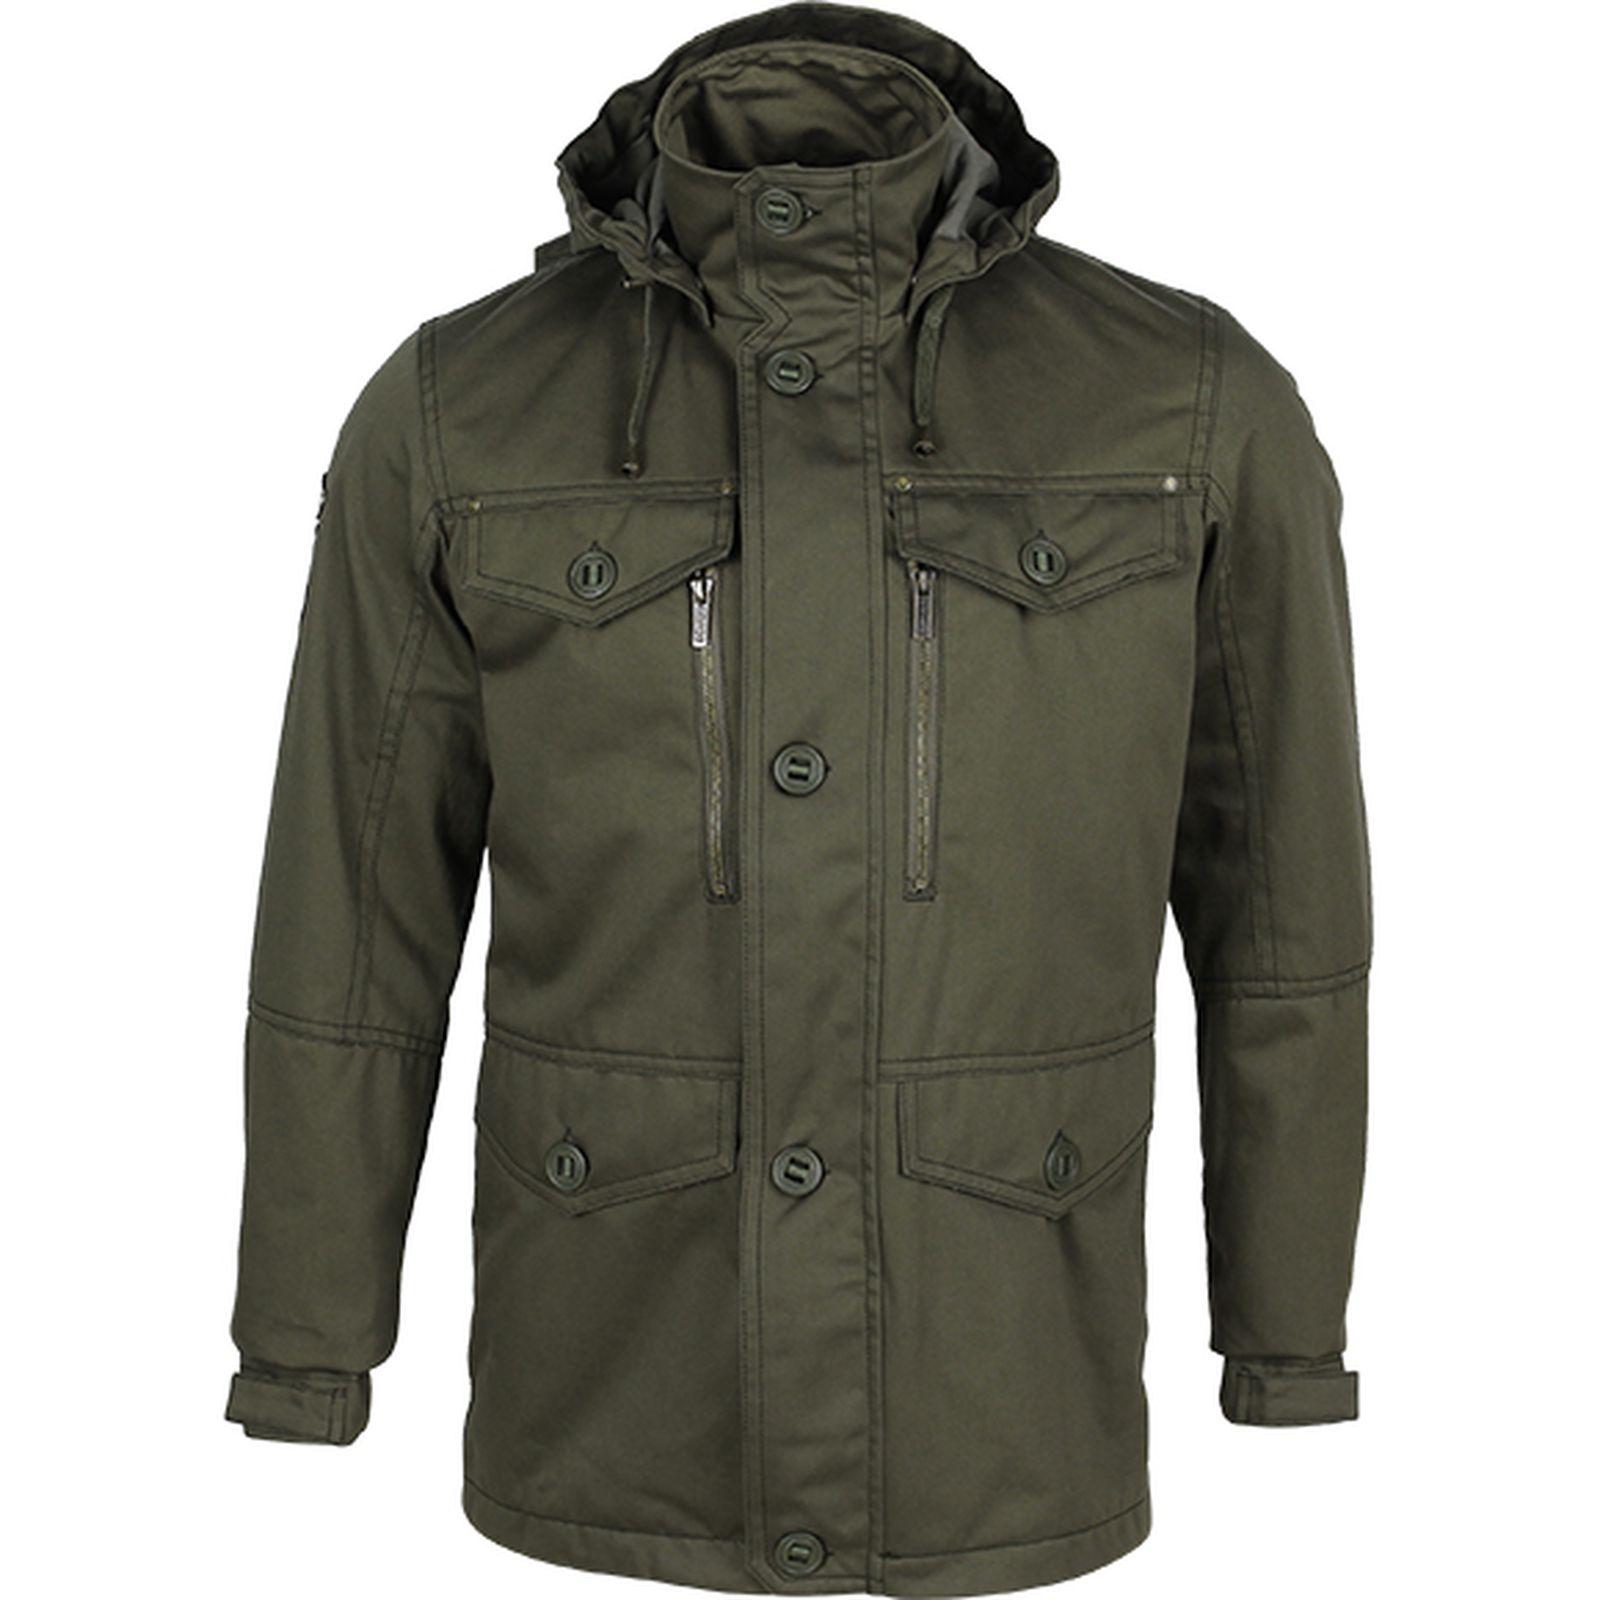 a7451ee2695 Куртка Splav «Defence» Cordura® (темно-оливковый